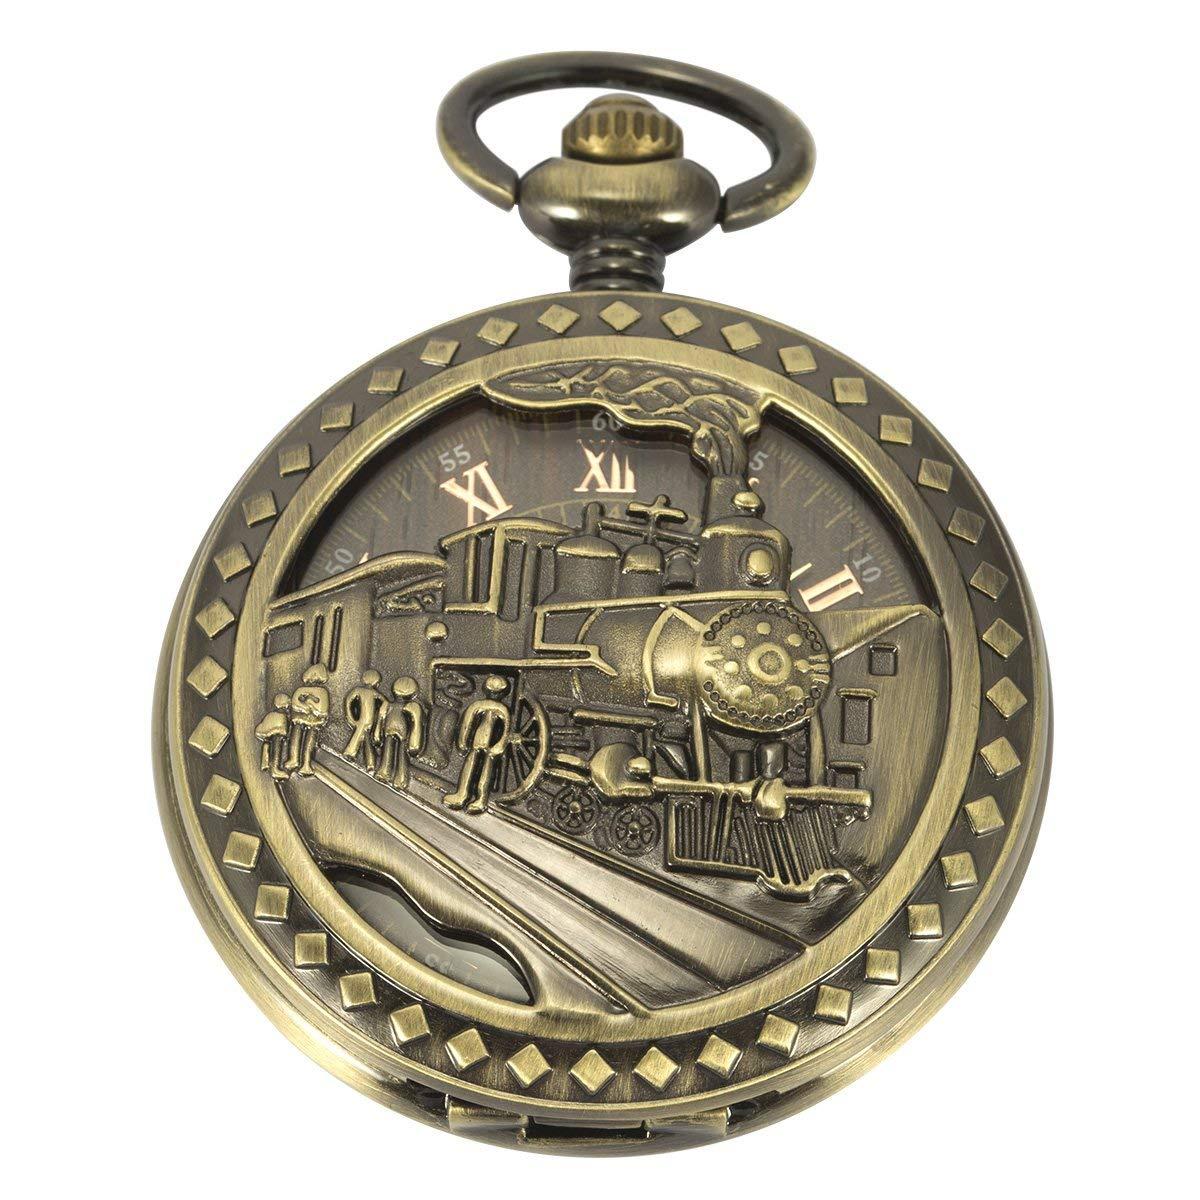 SIBOSUN Antique Pocket Watch Automatic Mechanical 3D Locomotive Steam Train Railroad Men Skeleton Chain